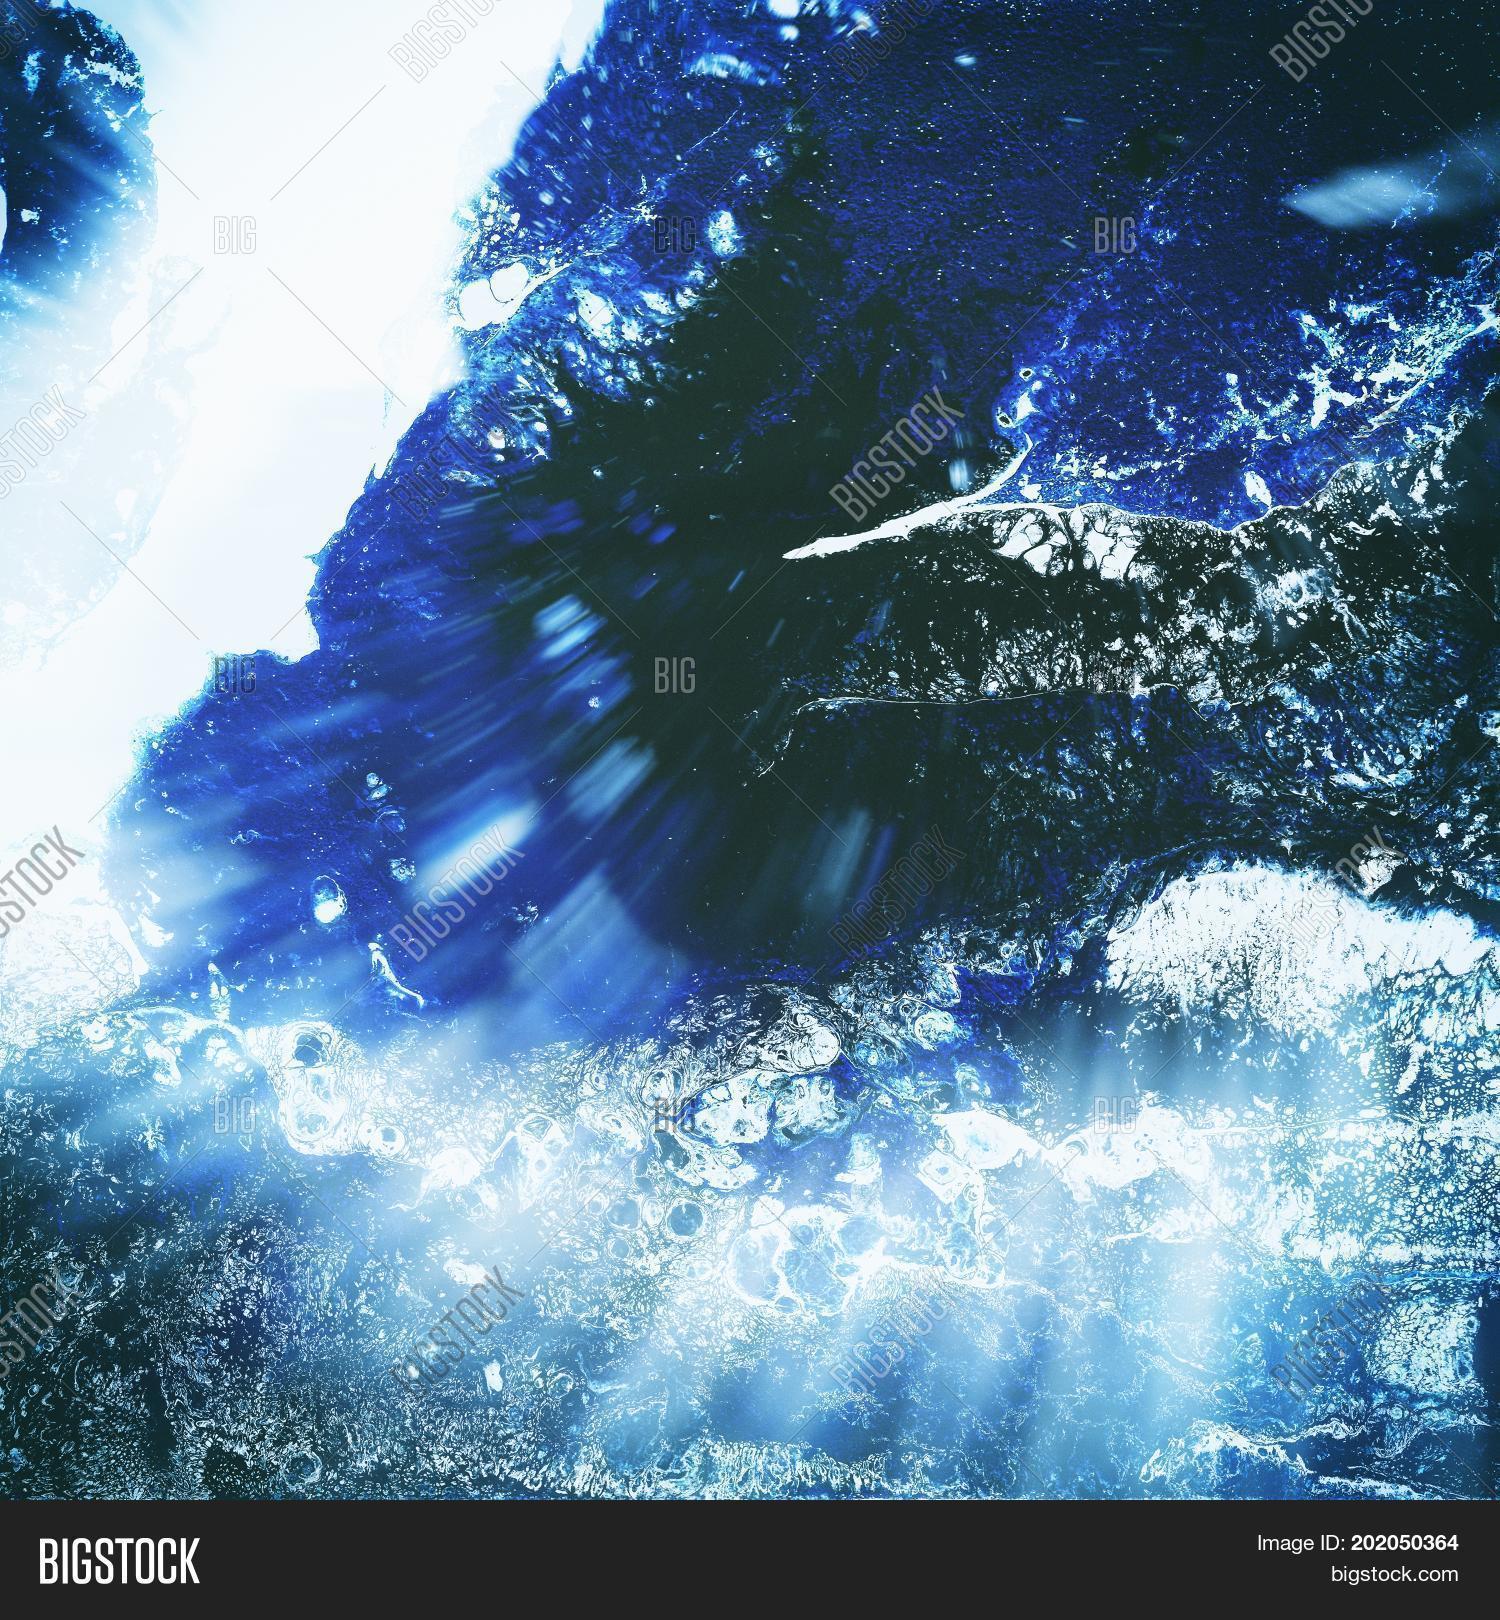 Liquid Acrylic Paint, Image & Photo (Free Trial) | Bigstock